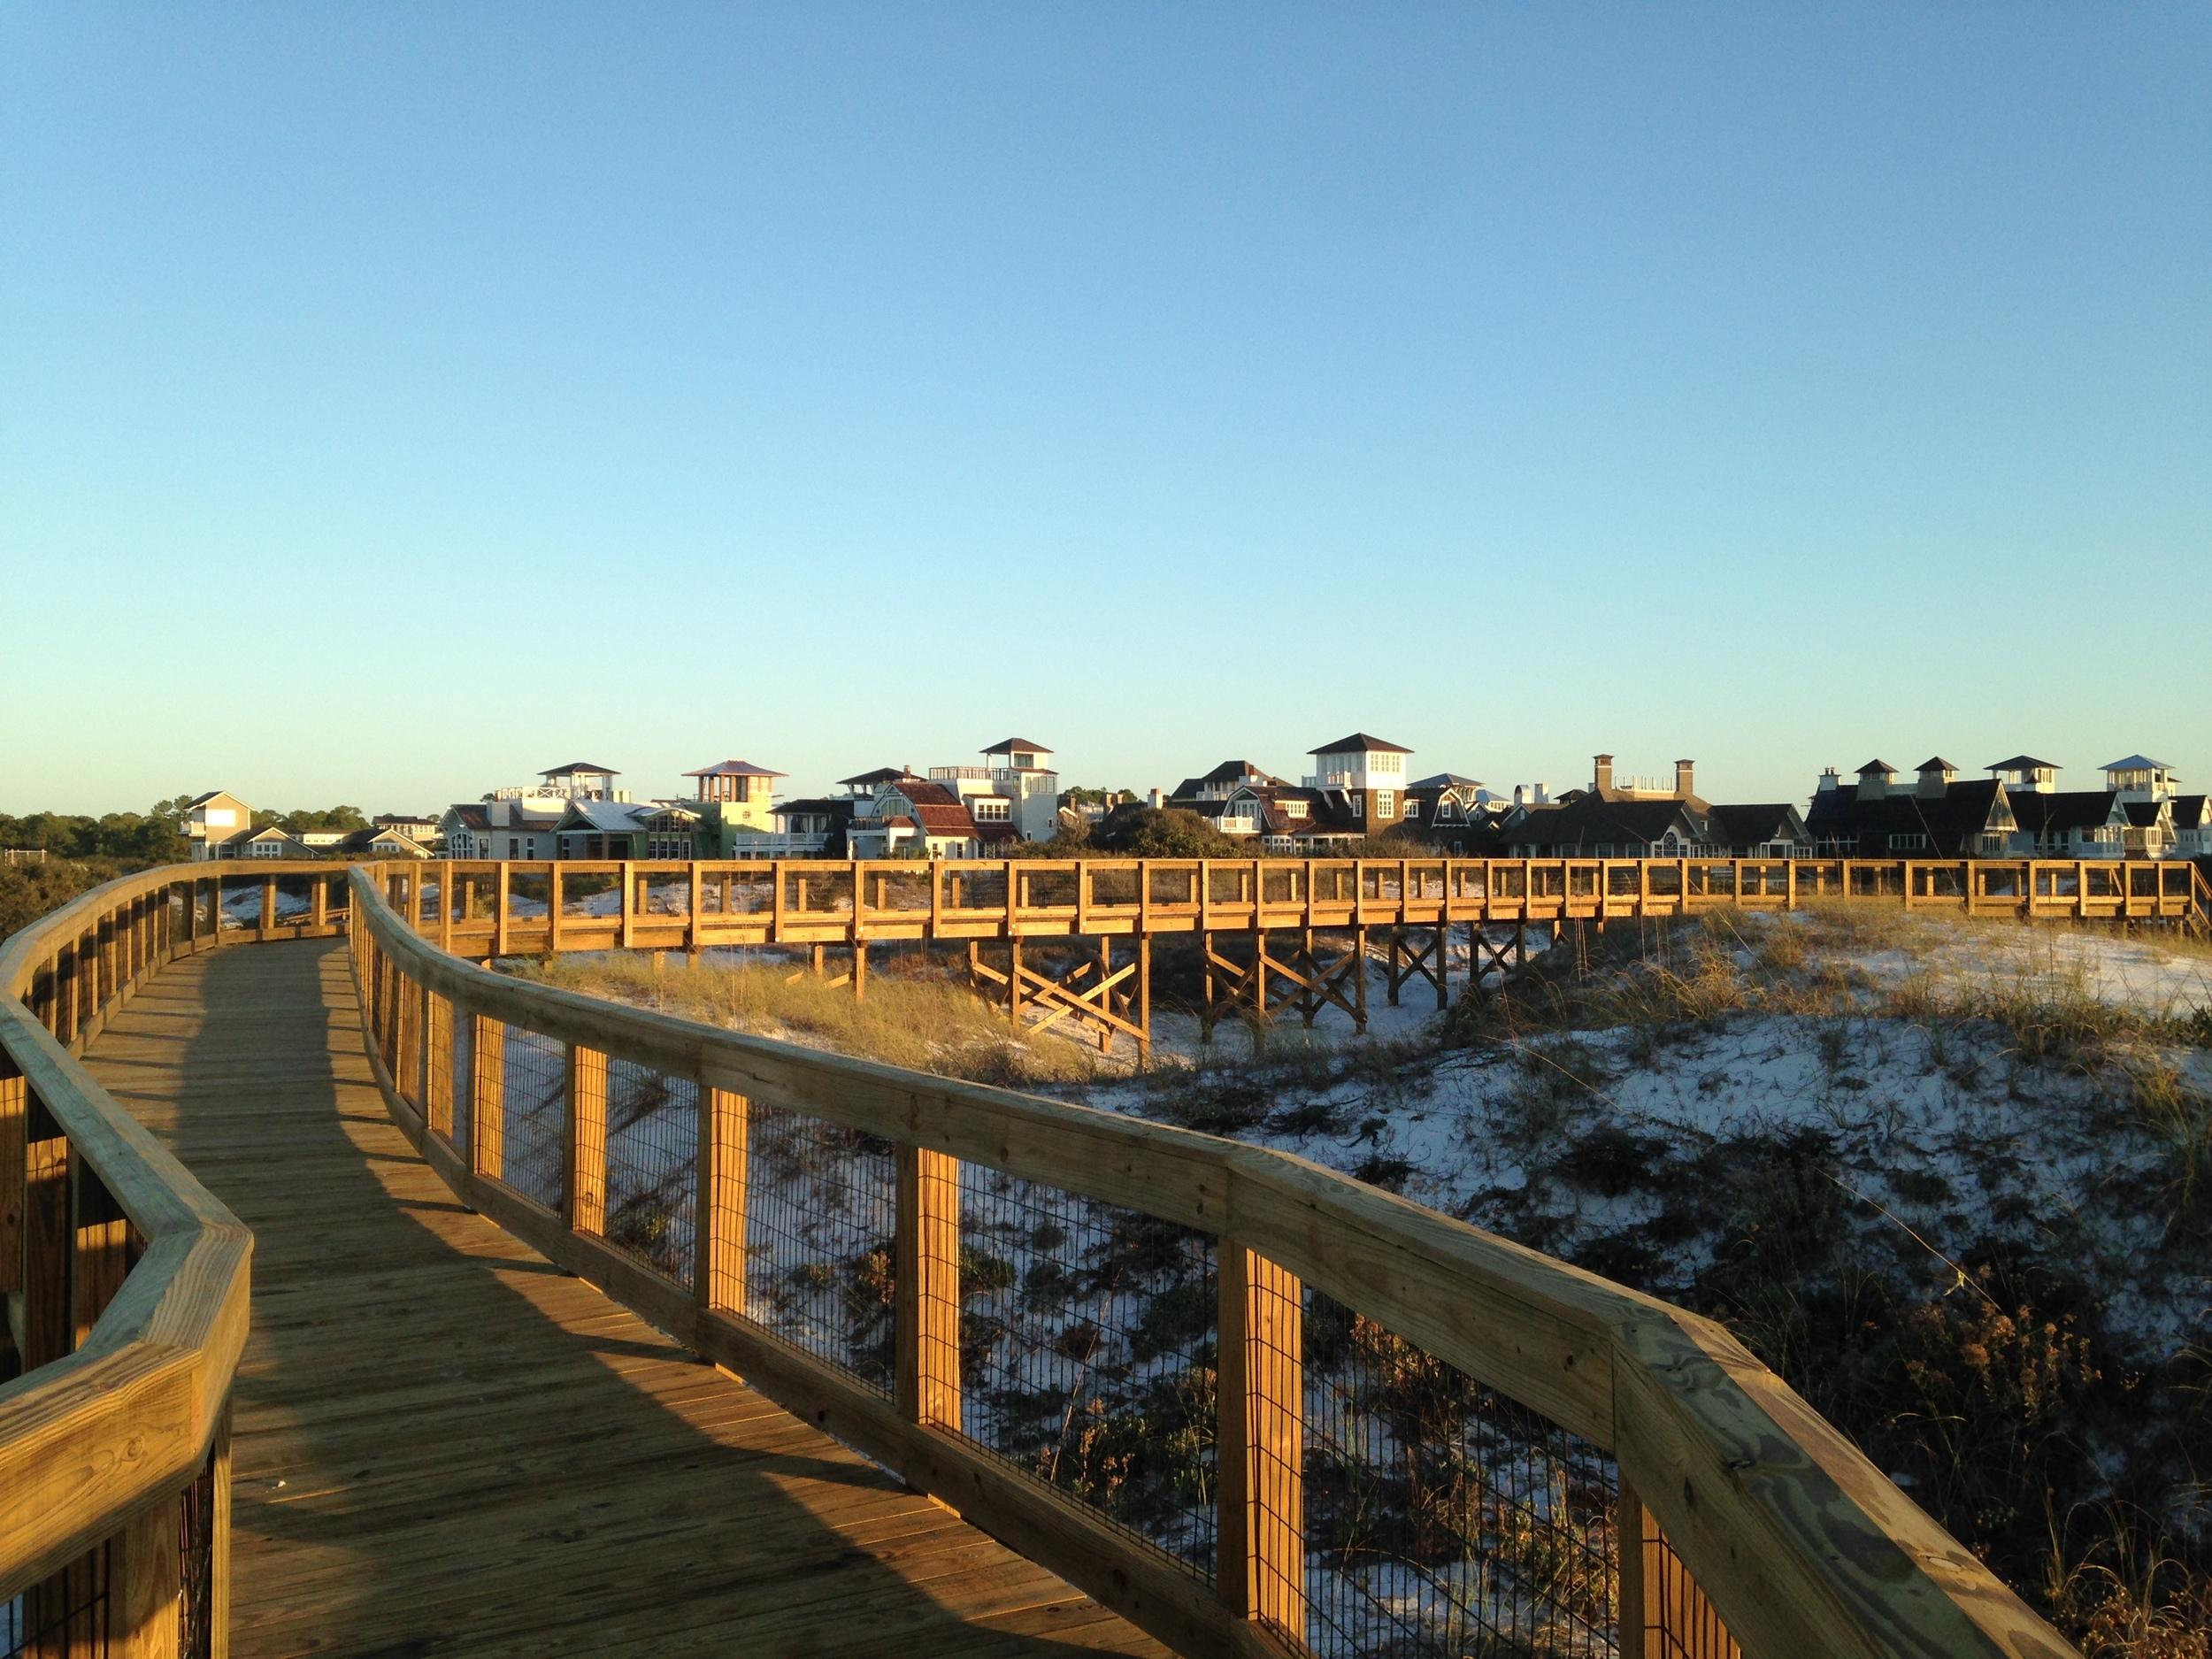 Beach Access and Boardwalk